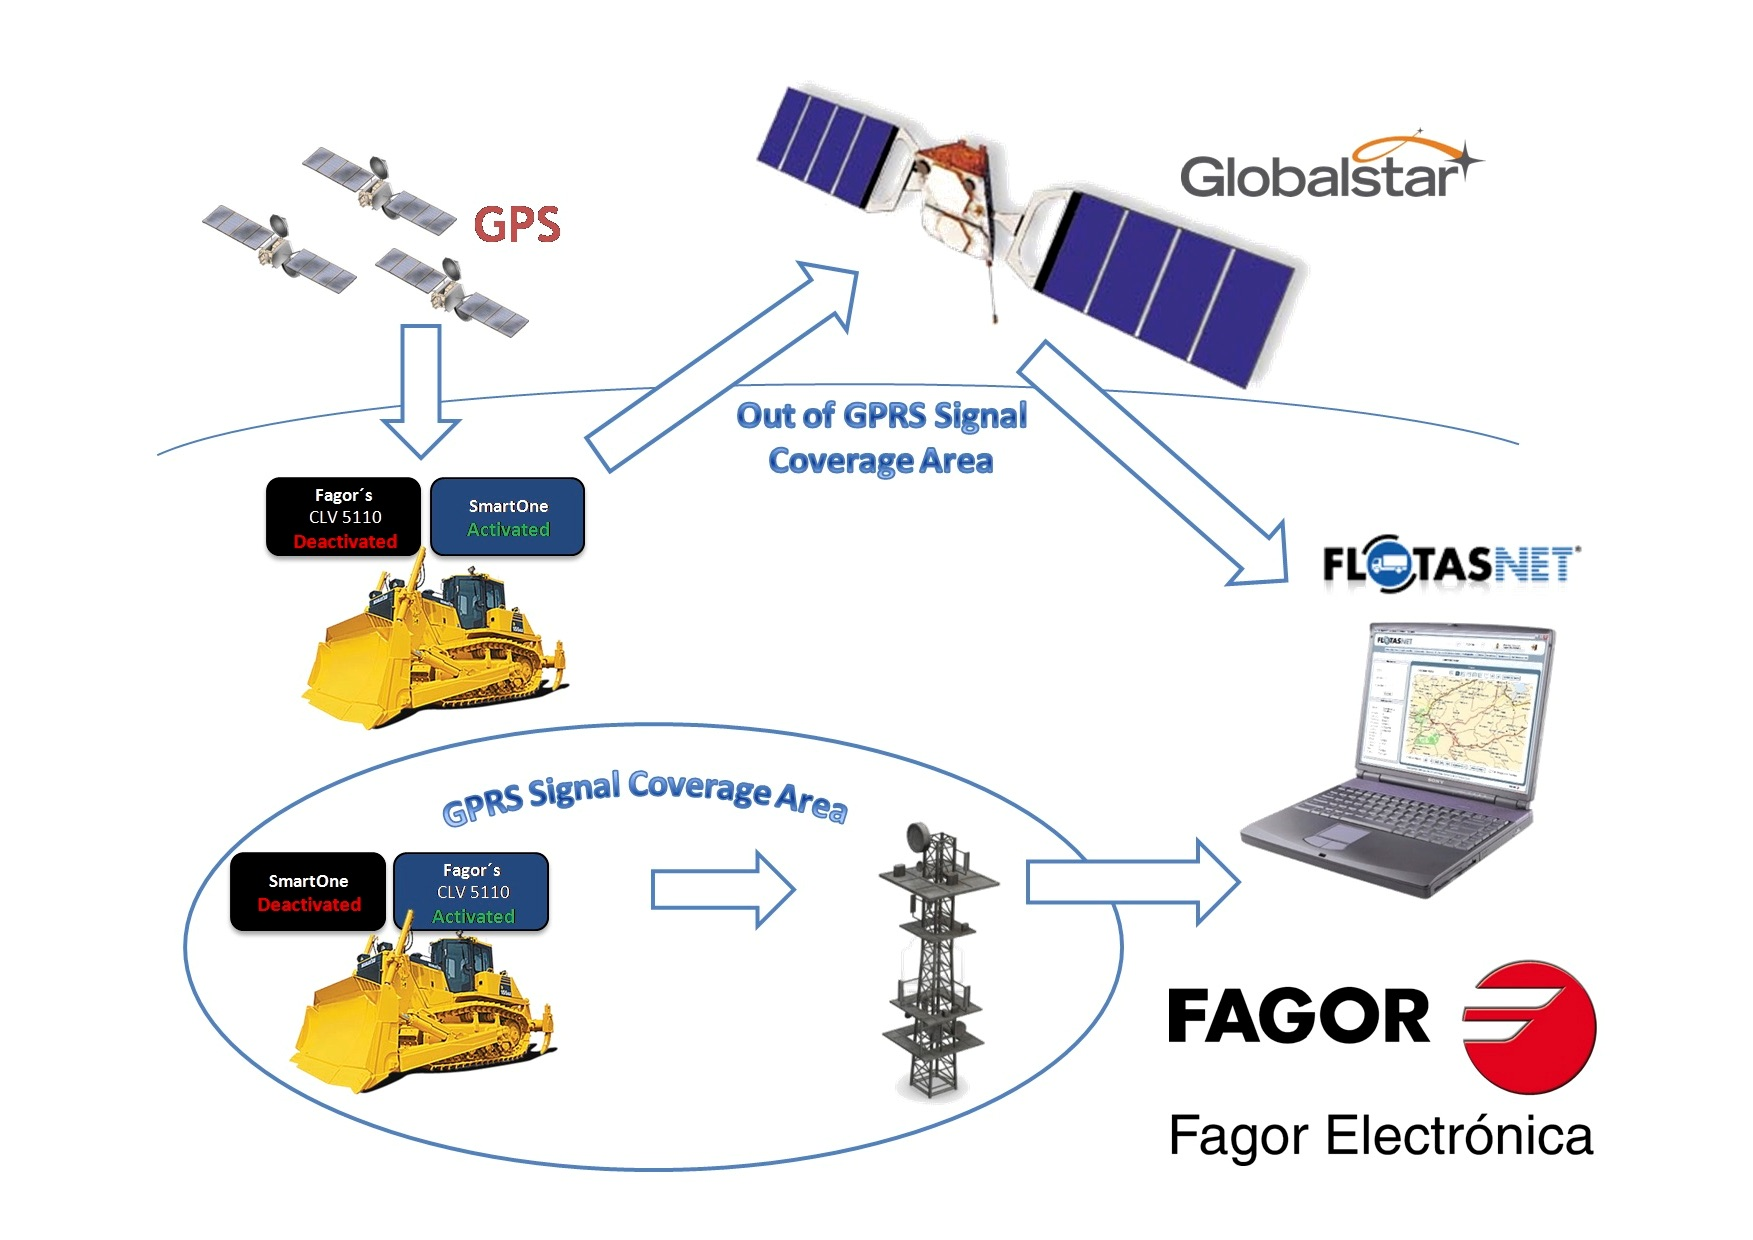 FAGOR graphic